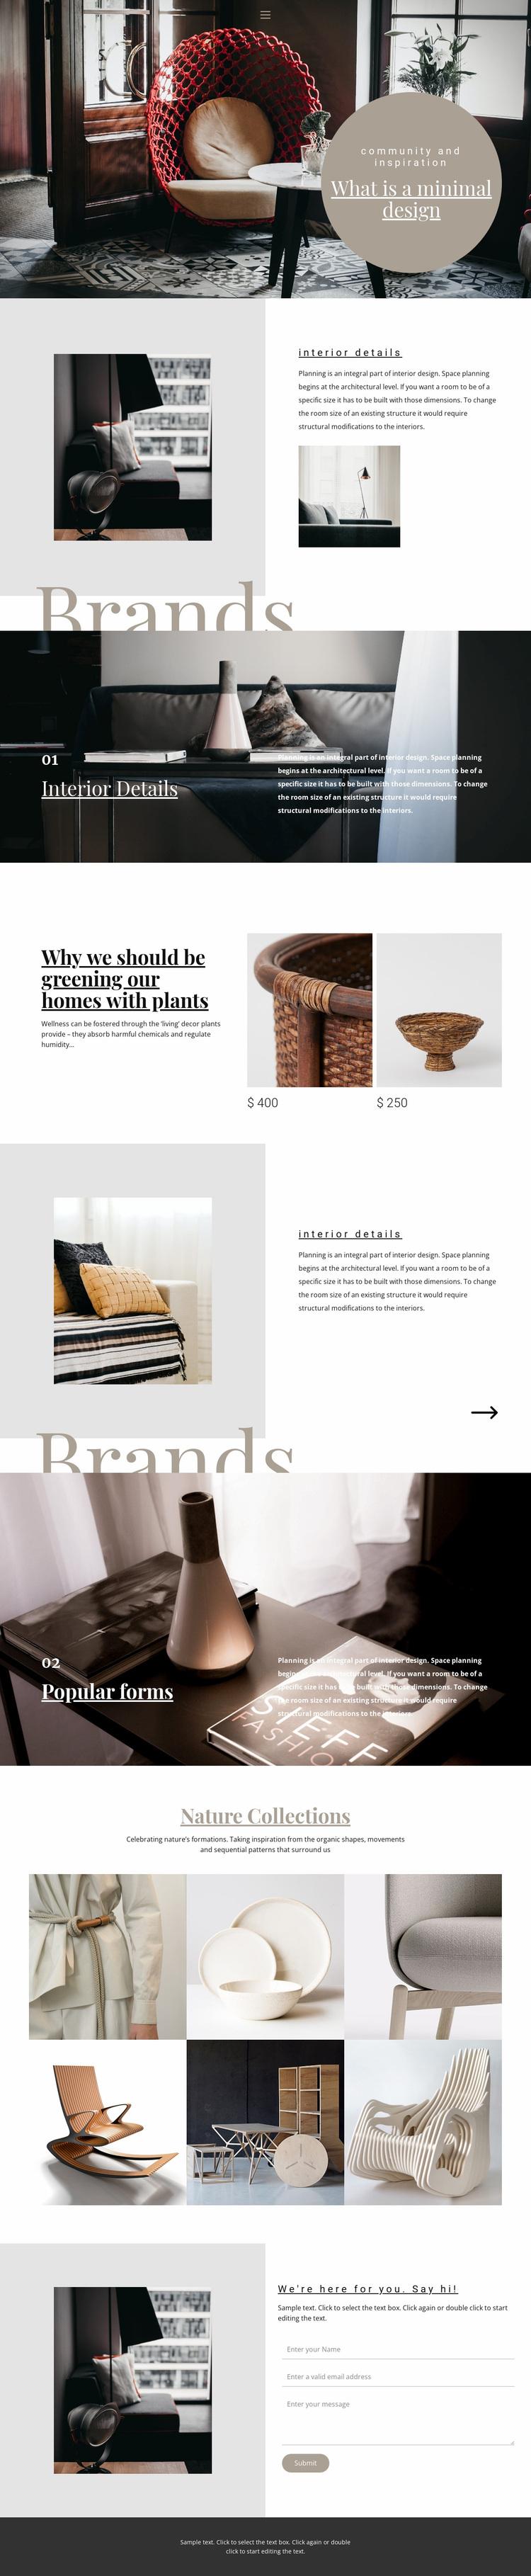 Interior brands Website Design